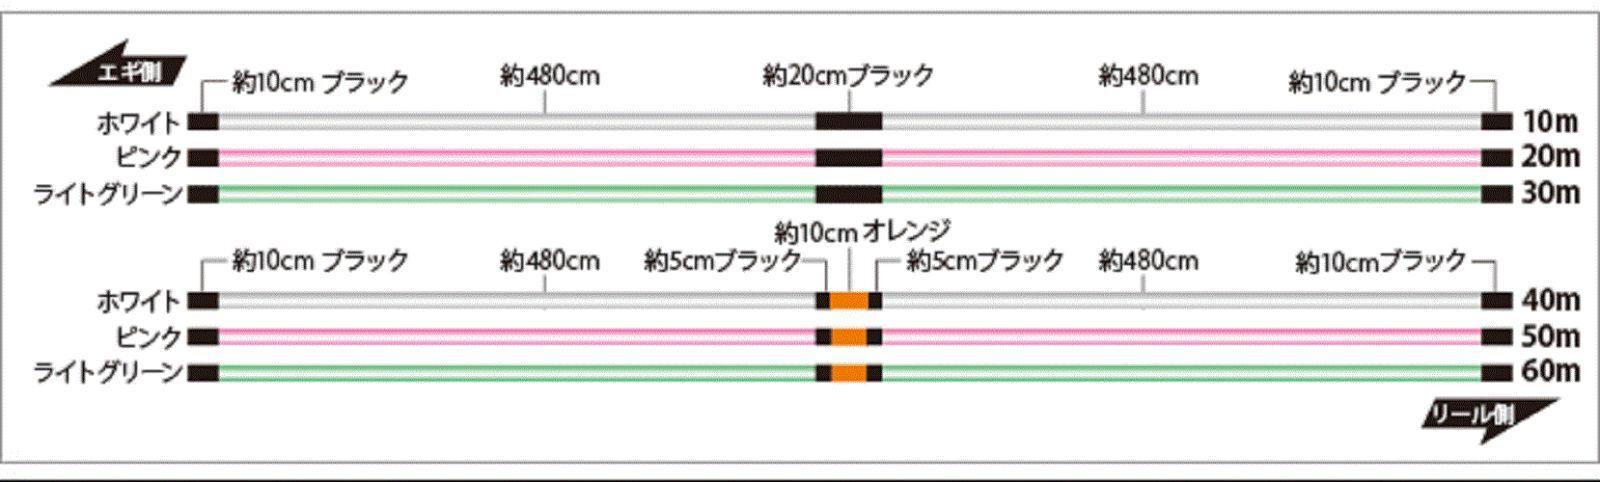 SUNLINE Salti Mate PE EGI EGI EGI ULT HS8 240m for Eging 8 Braid Line 8b674d